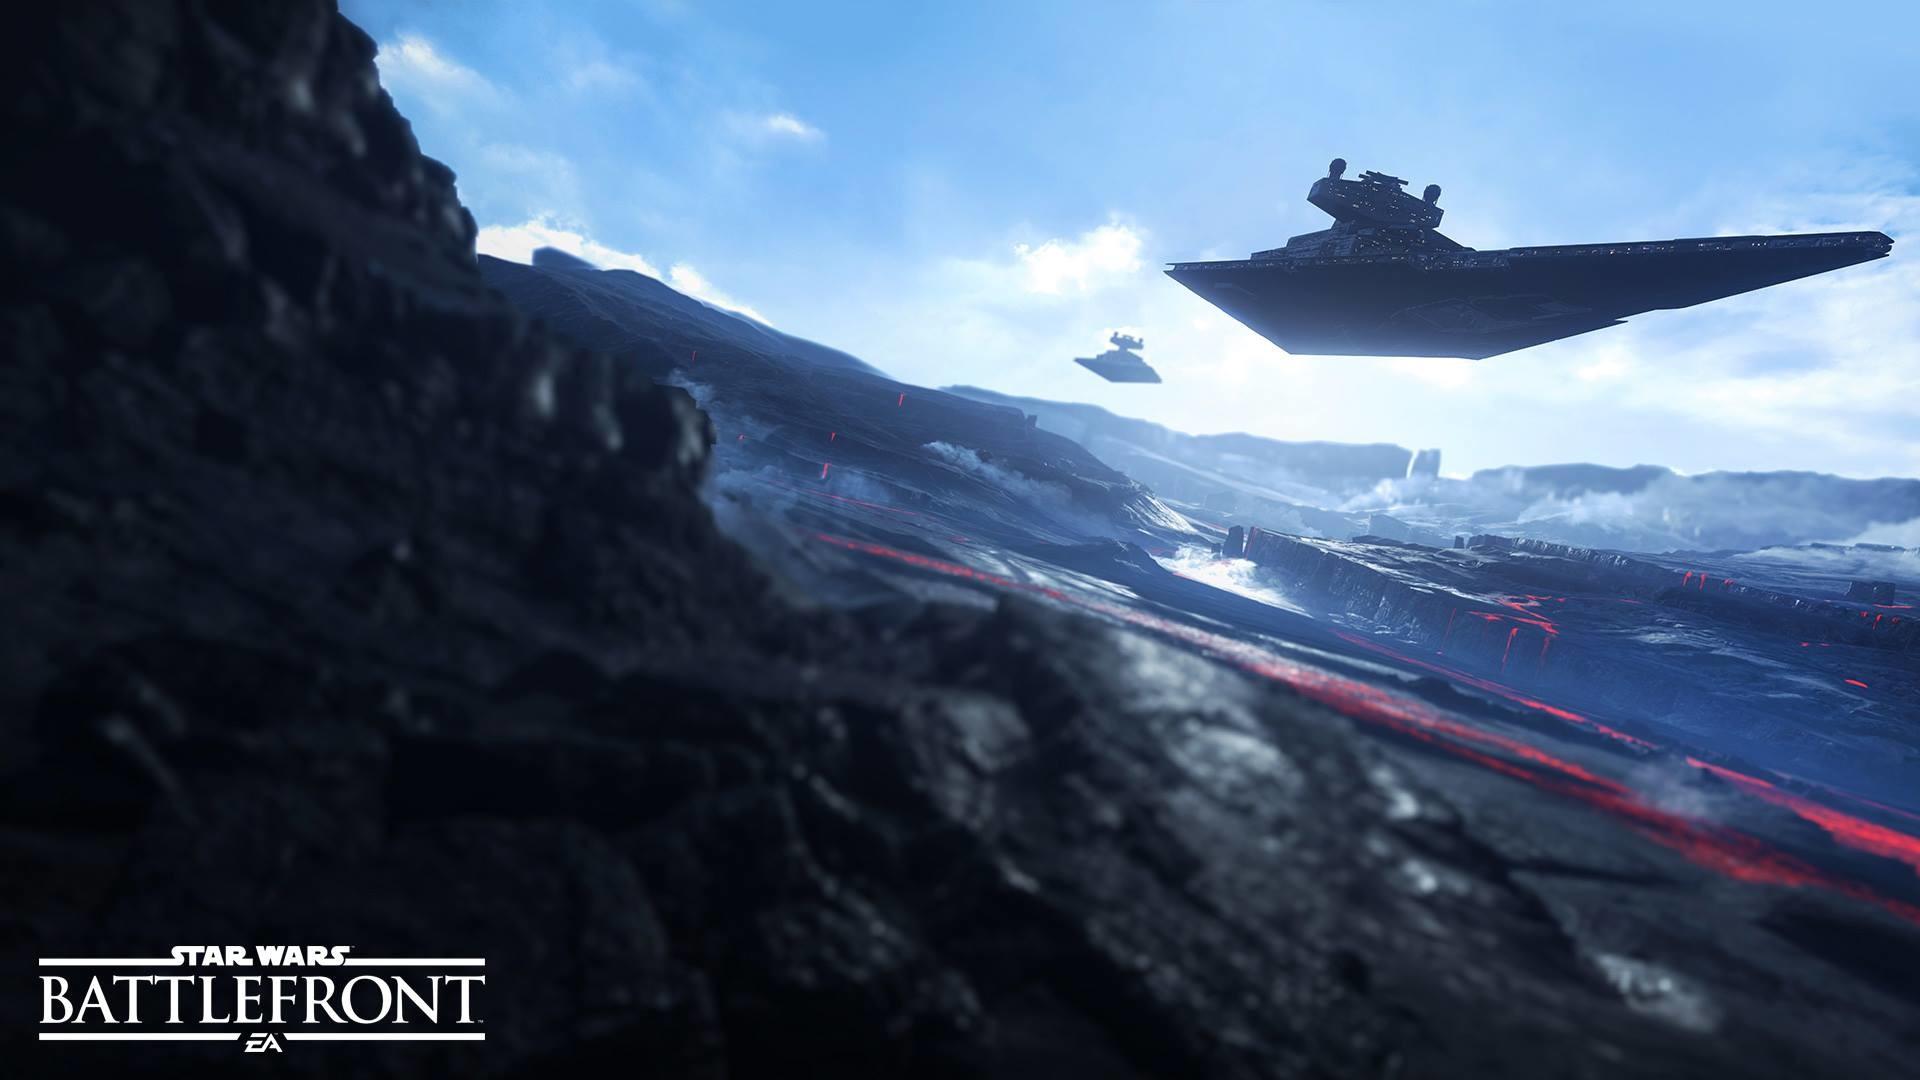 … Star Wars Battlefront Wallpaper